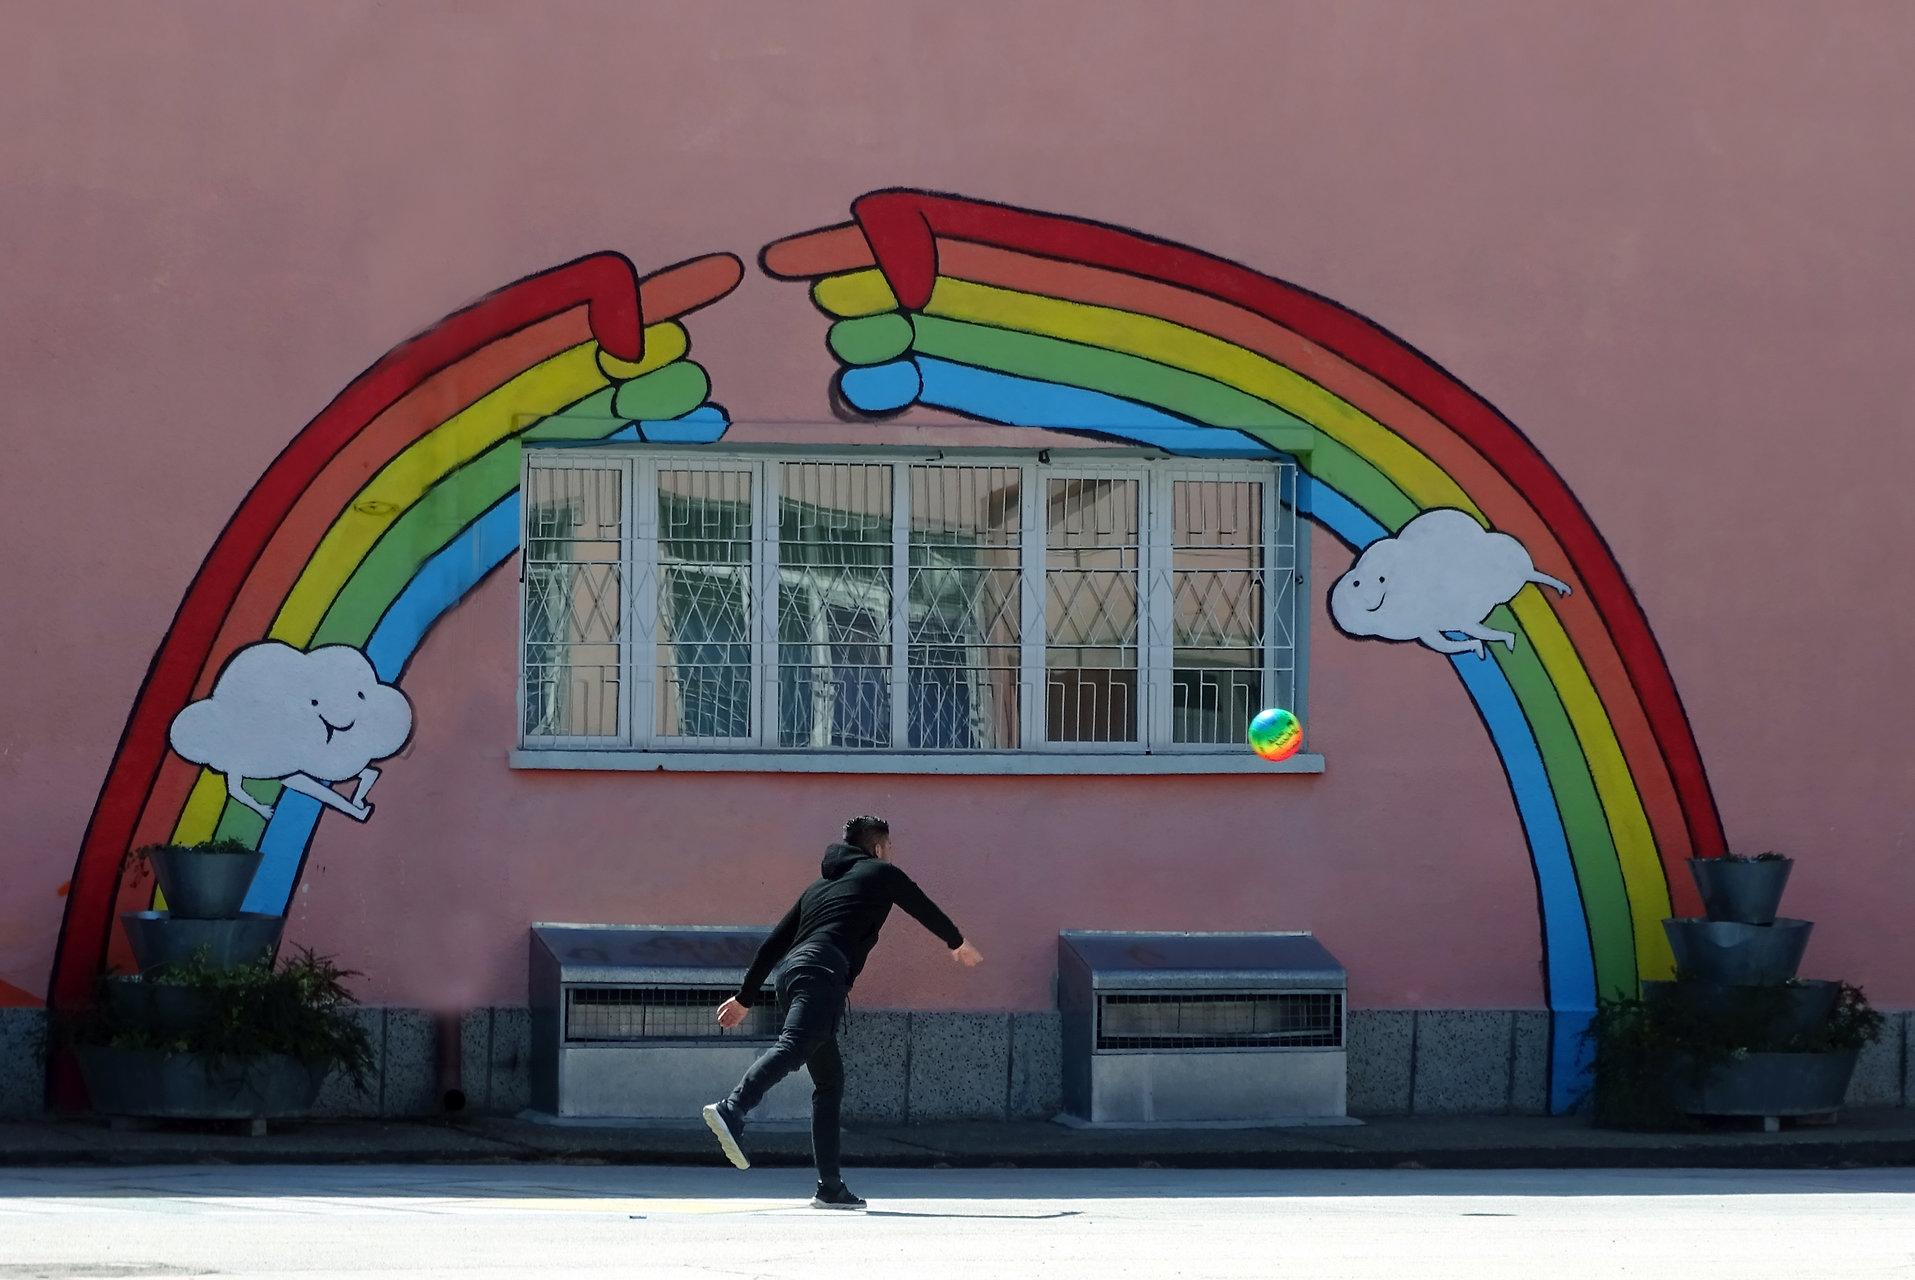 Photo in Seen in my city | Author Ihif | PHOTO FORUM